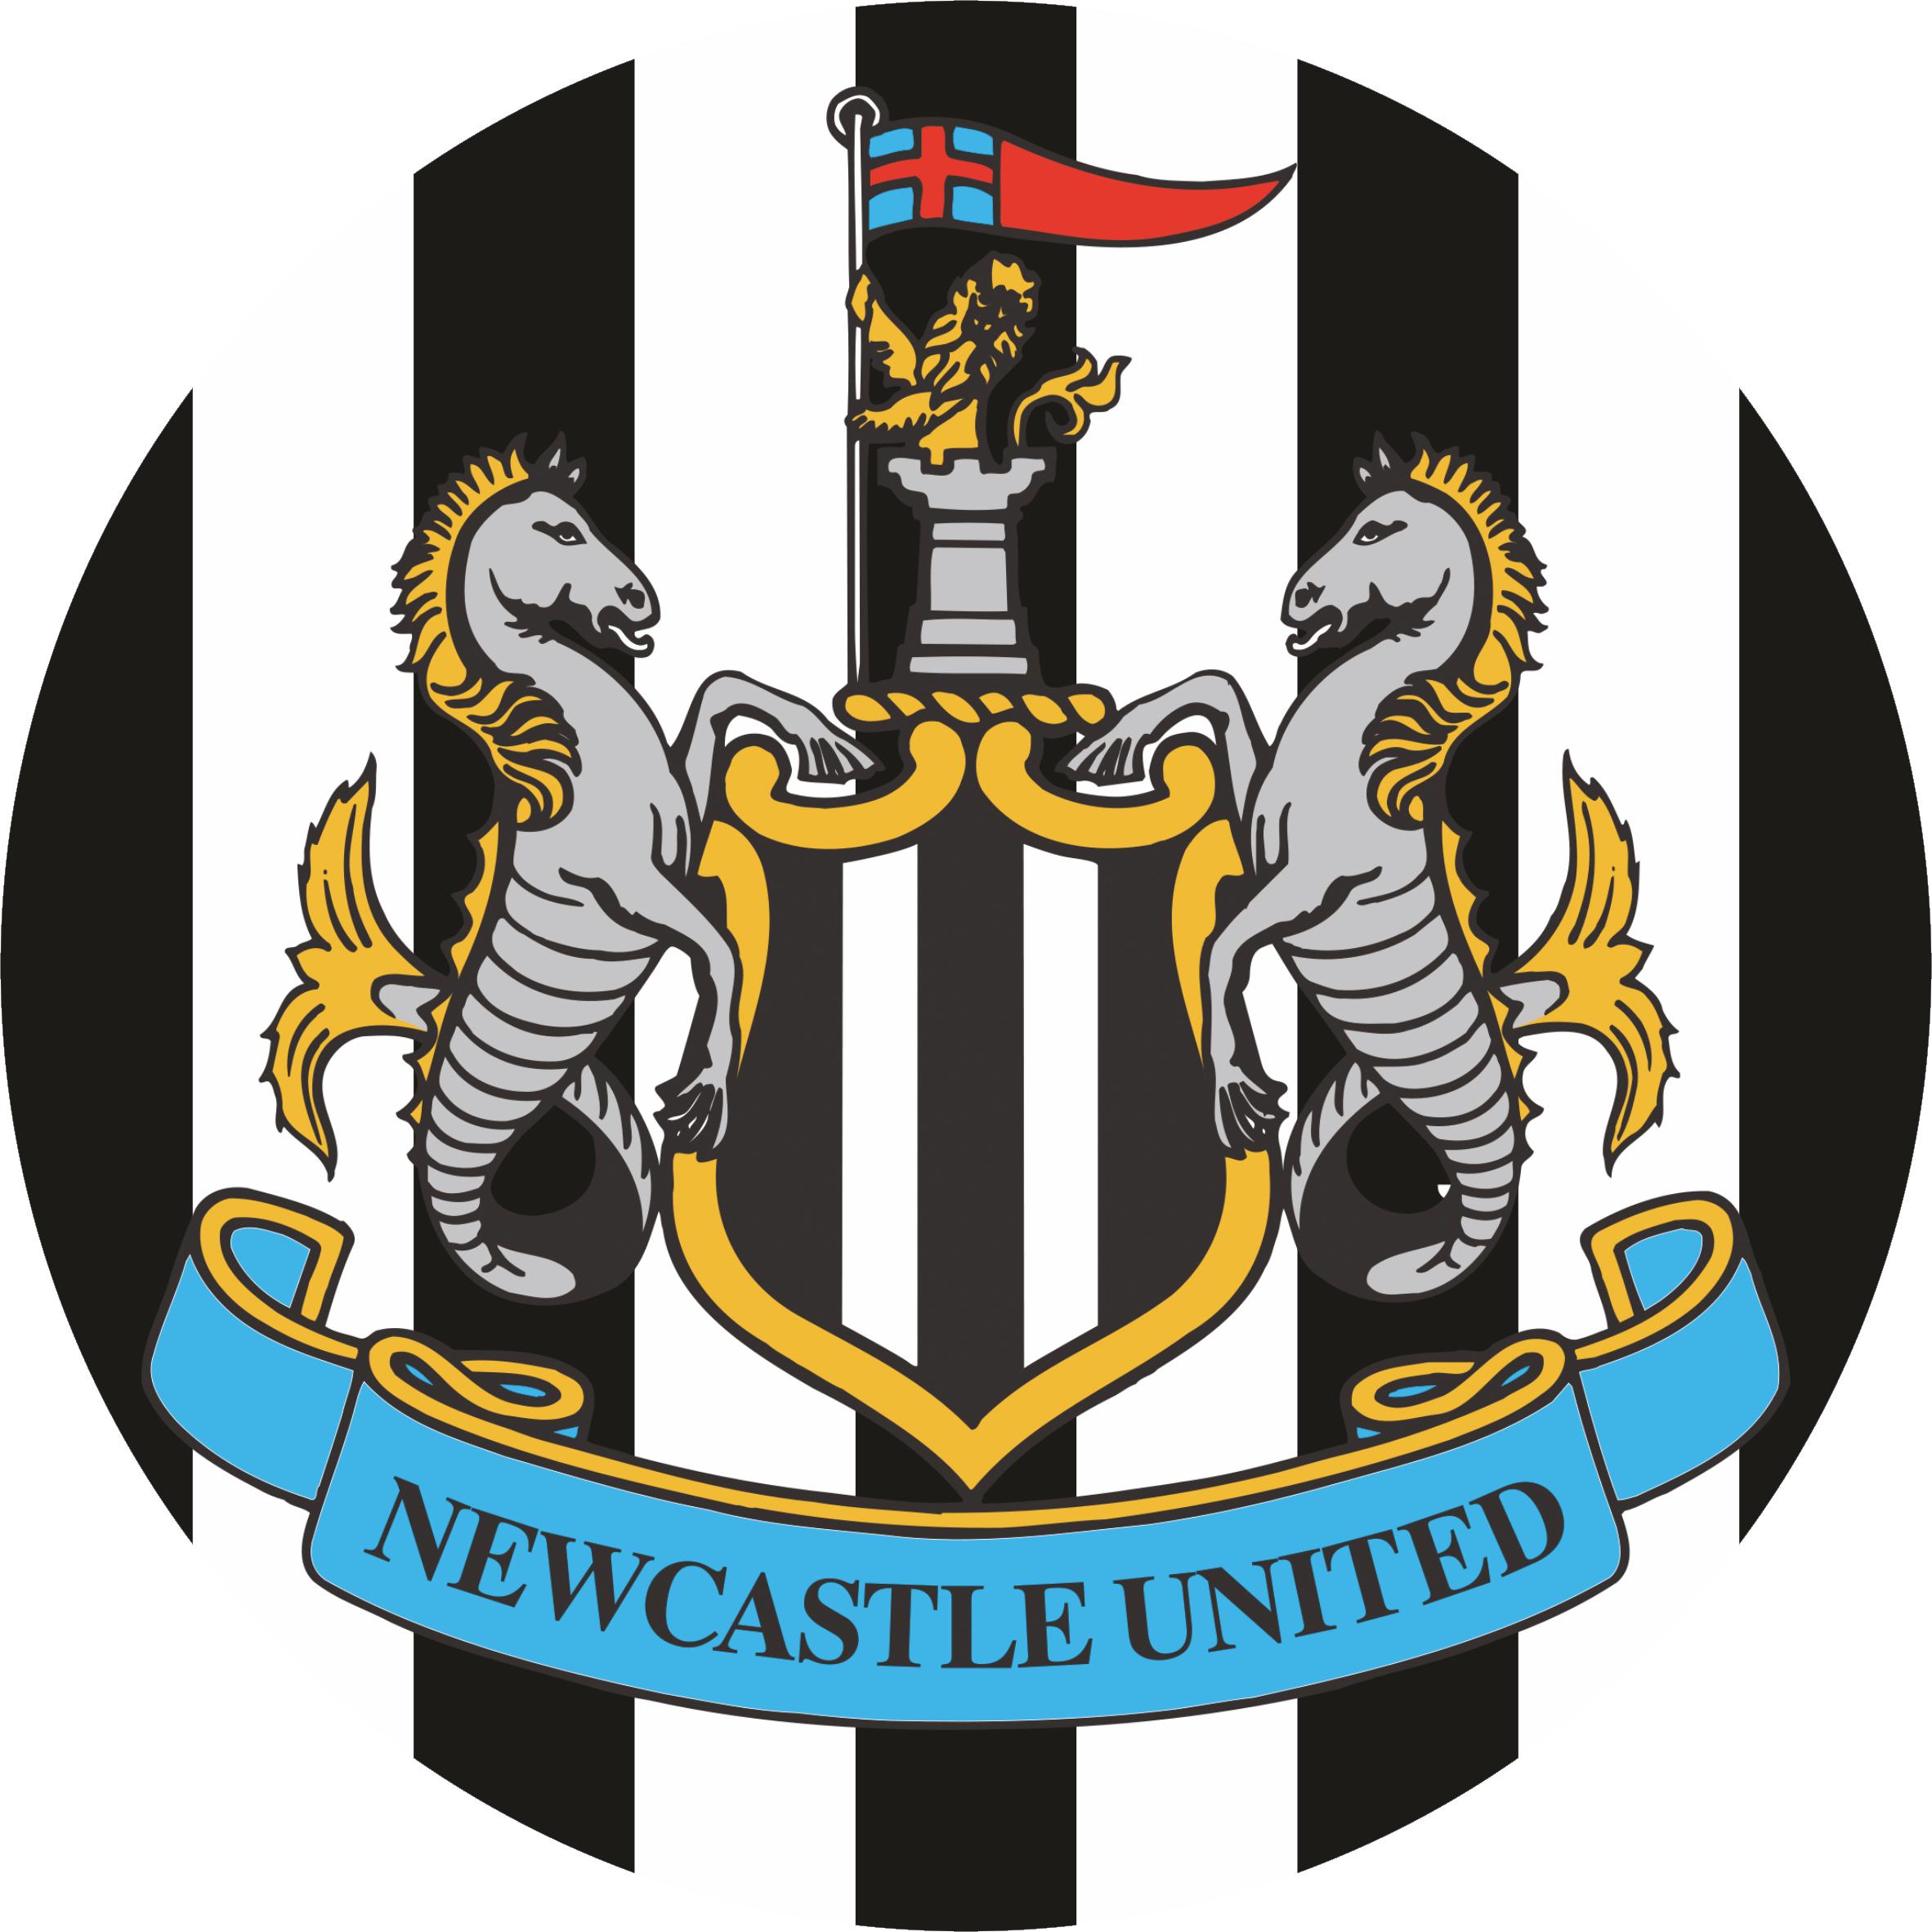 Newcastle United Football Club - Toptacular